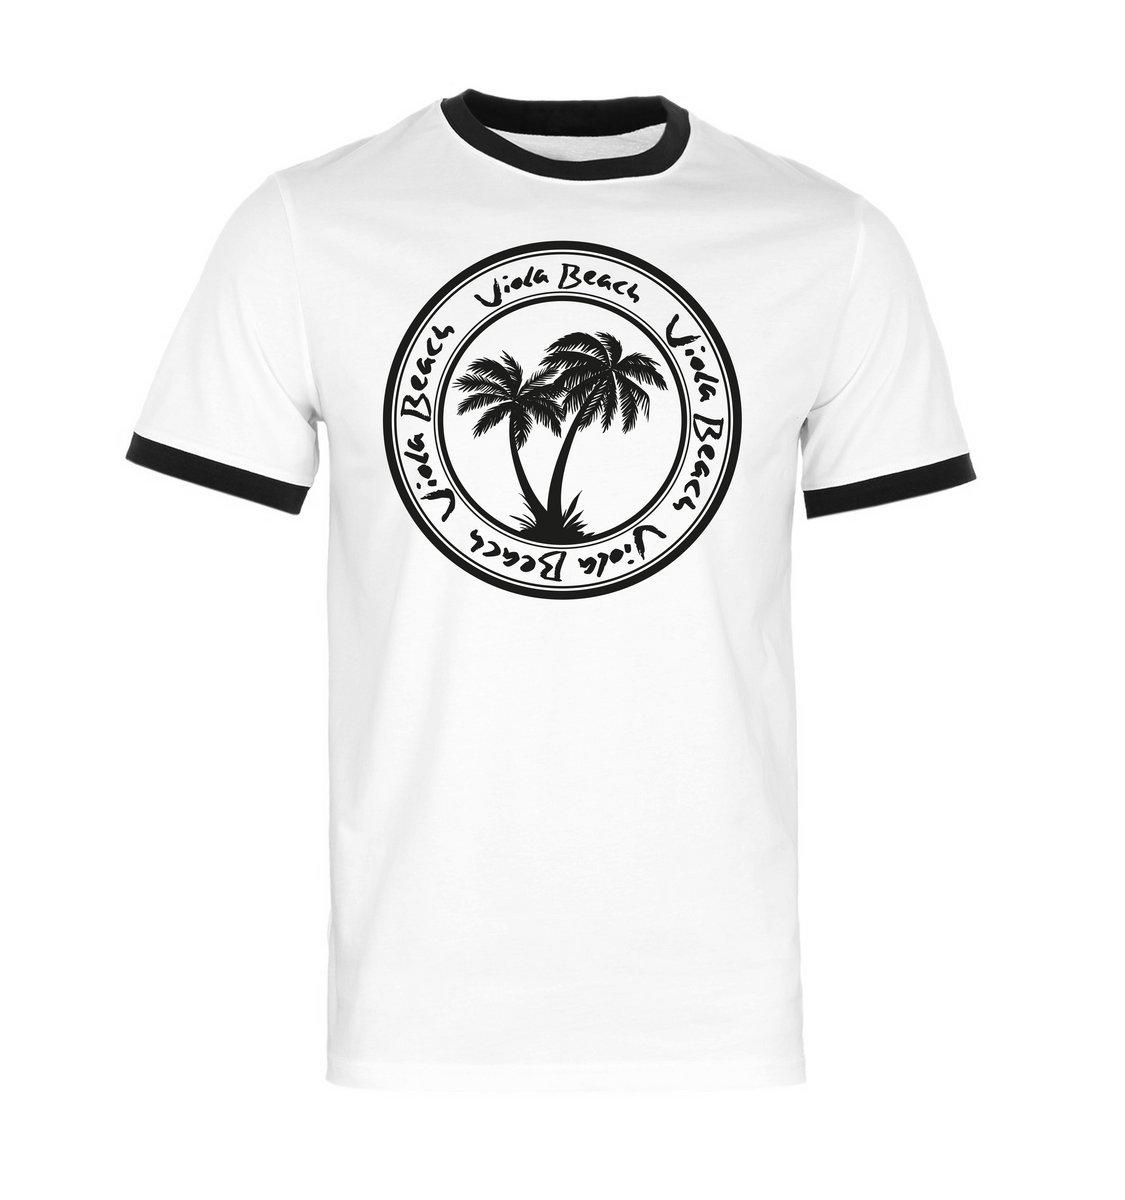 Ltd edition viola beach logo tee pre order viola beach for Where to order shirts with logos